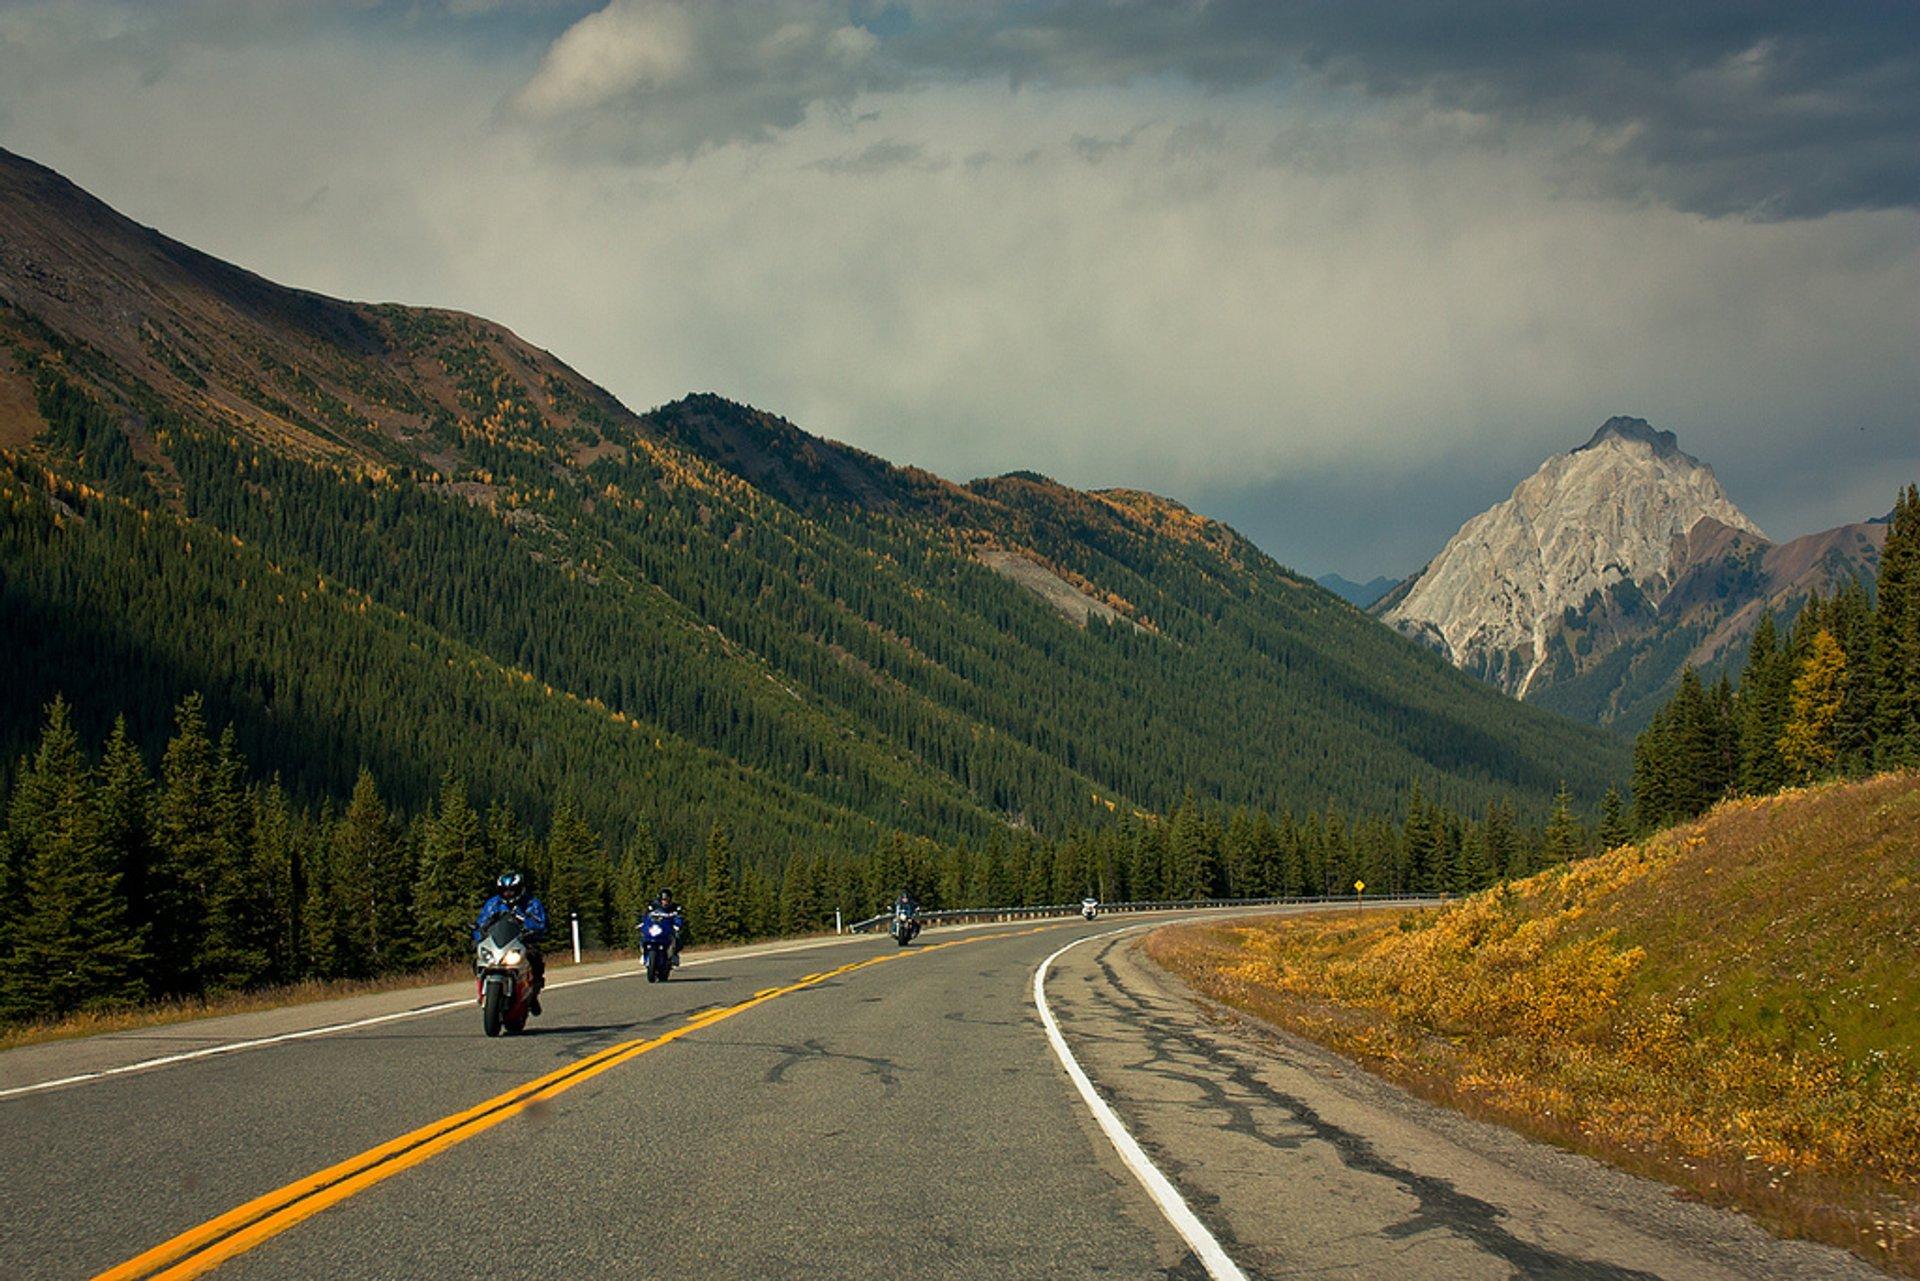 Alberta Highway 40 in Alberta 2019 - Best Time